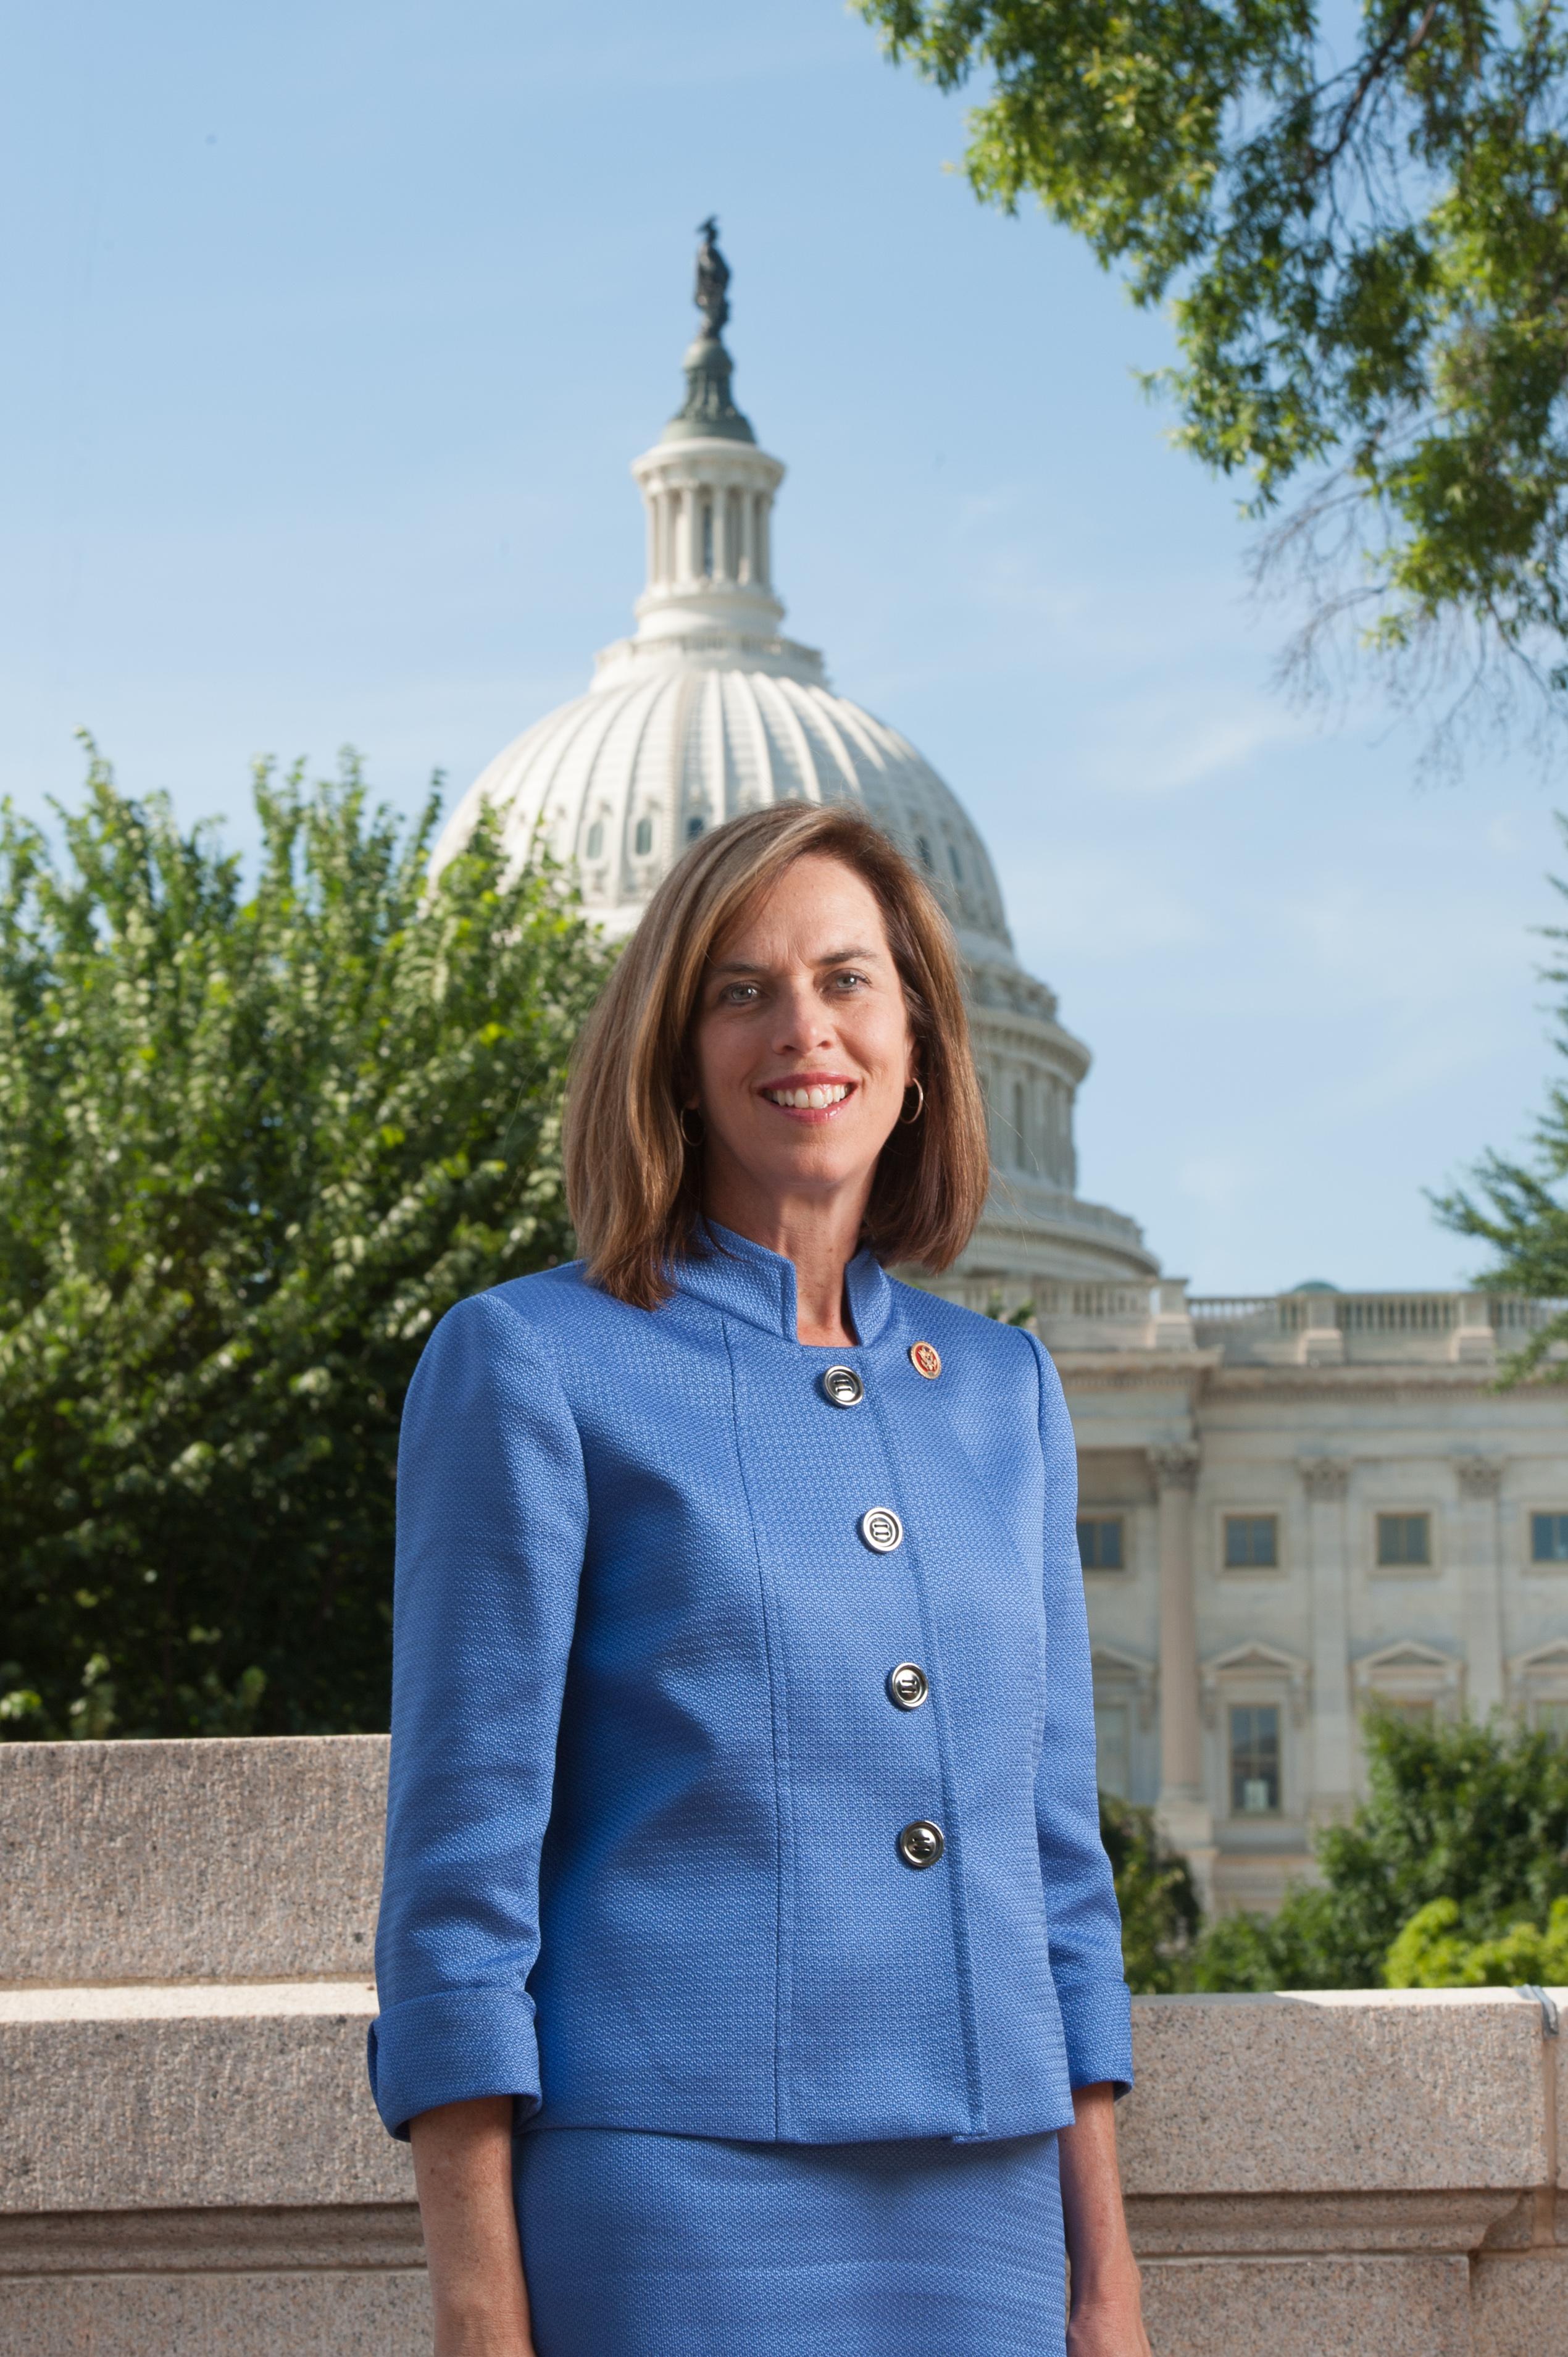 House of Representatives member Katherine Clark (D-Mass.)